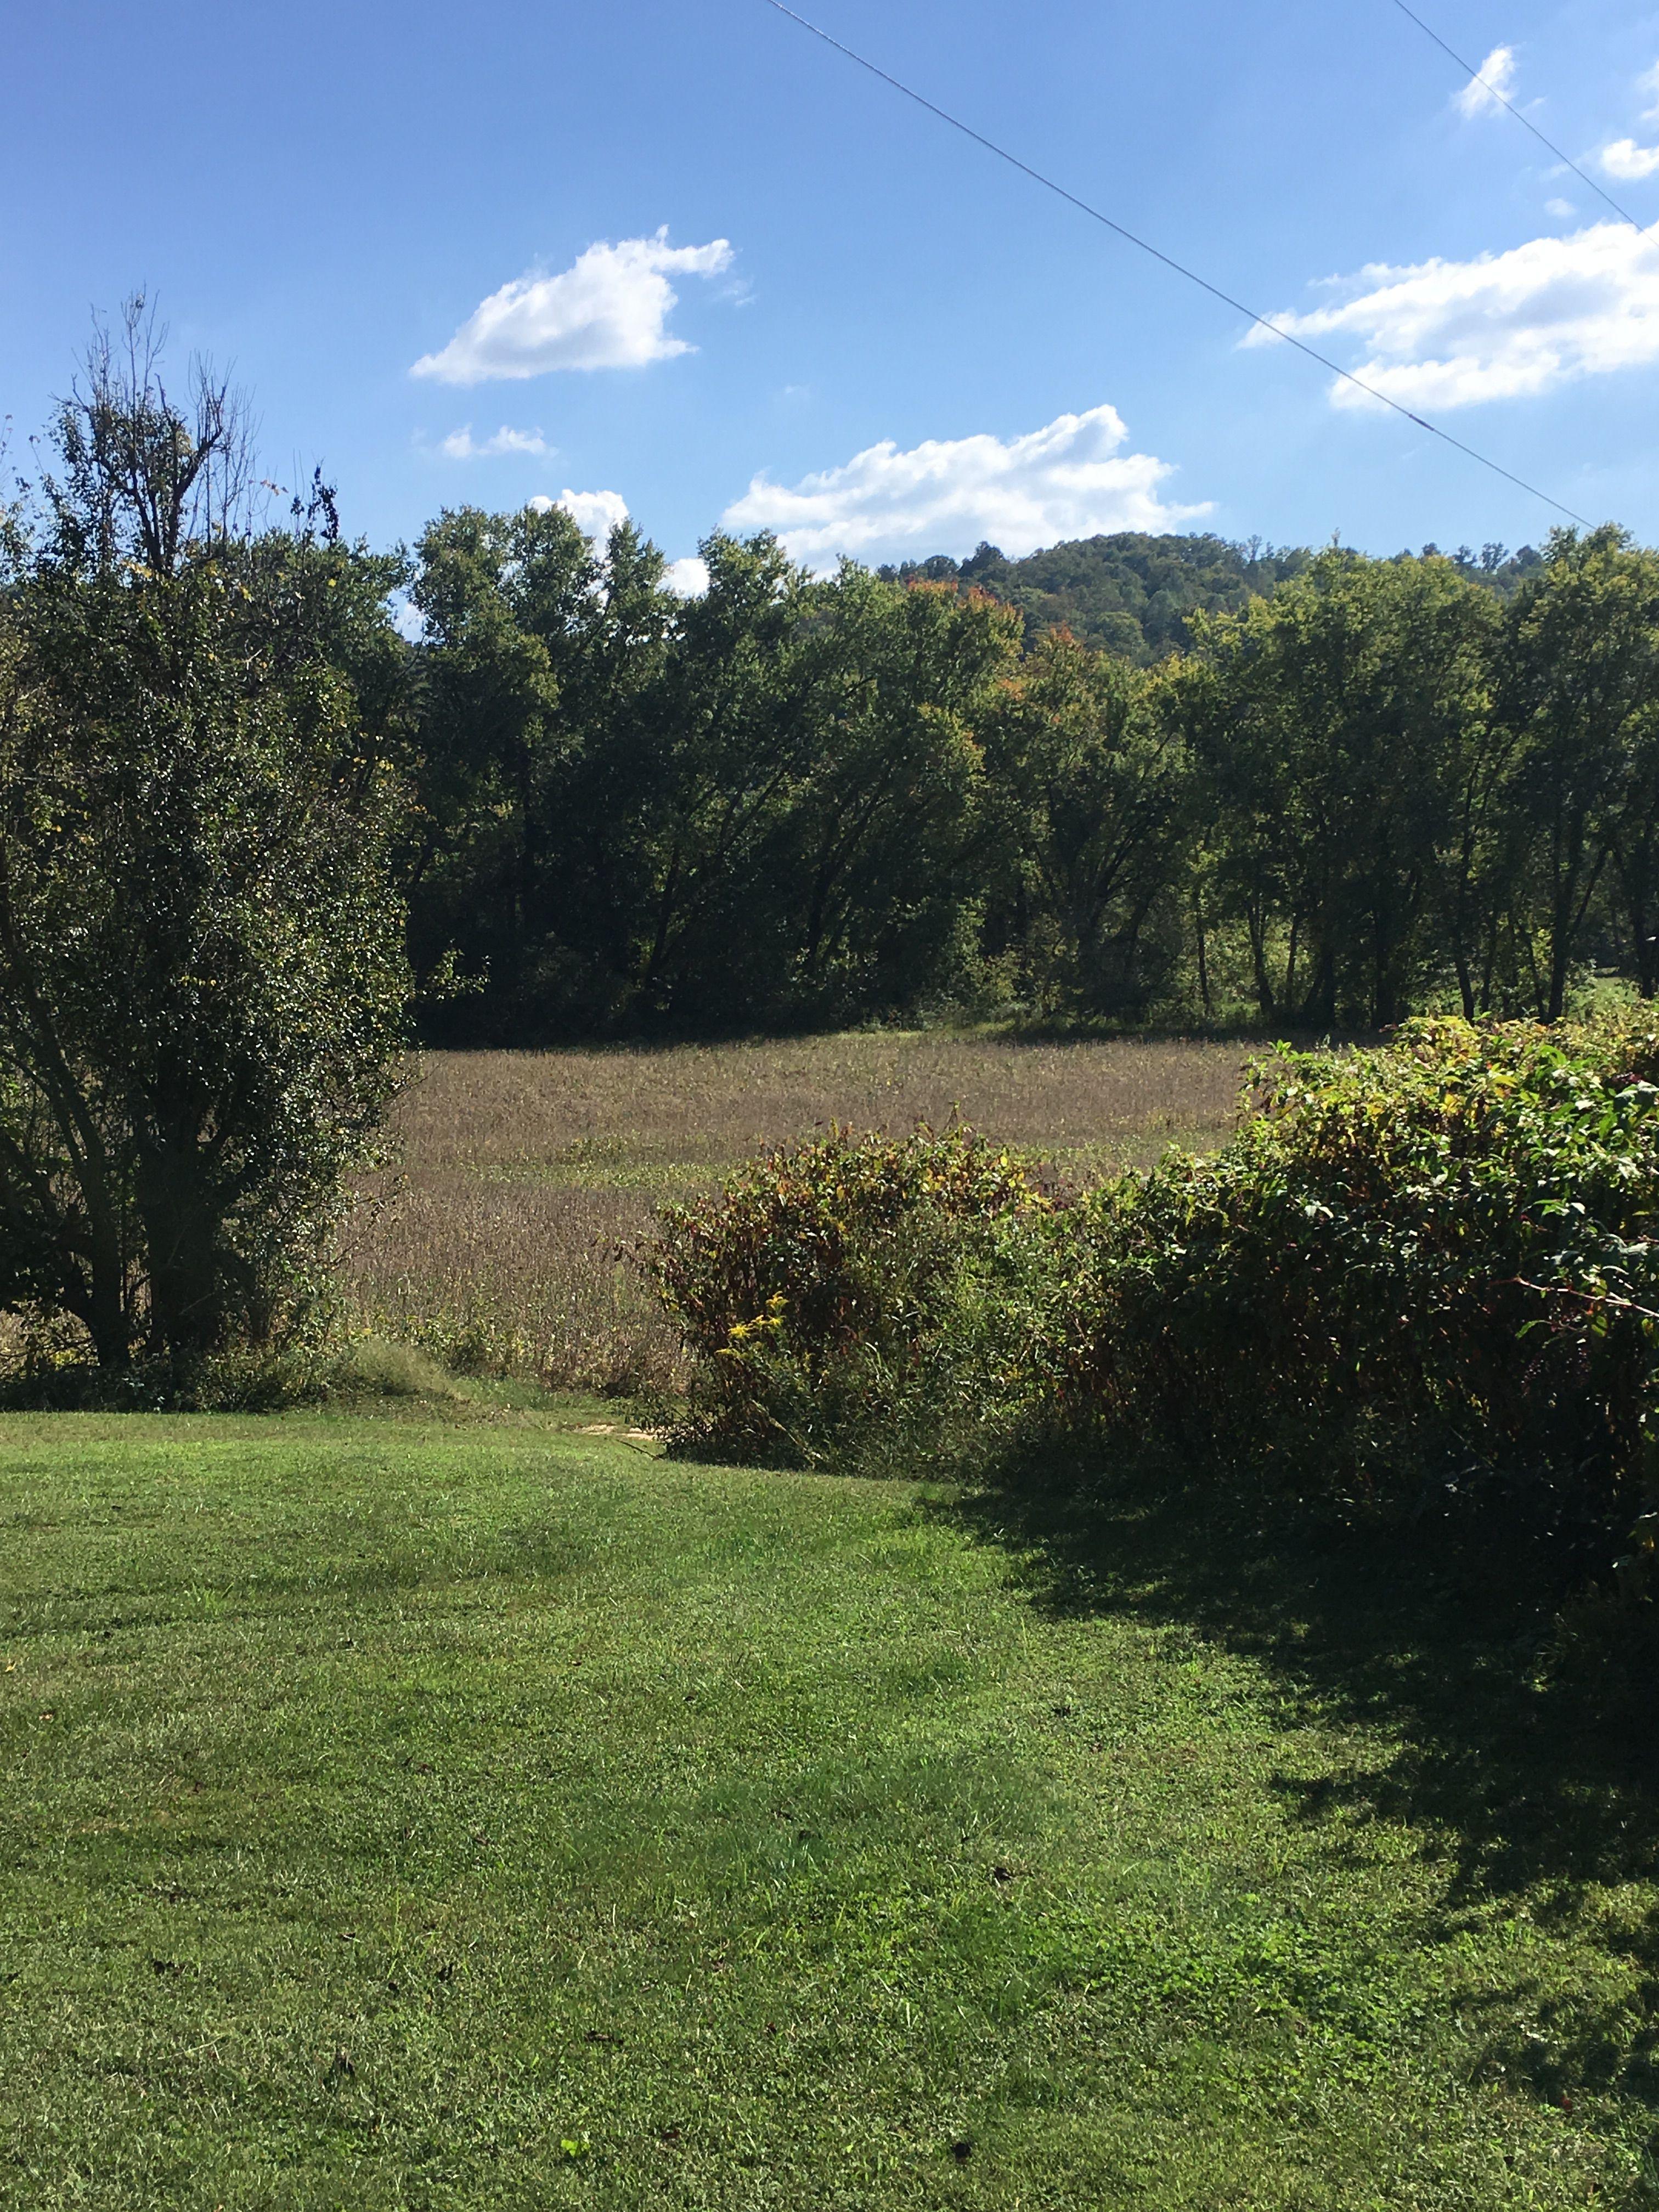 Holbrook Farm In Fallsburg Ky Natural Landmarks Outdoor Farmland